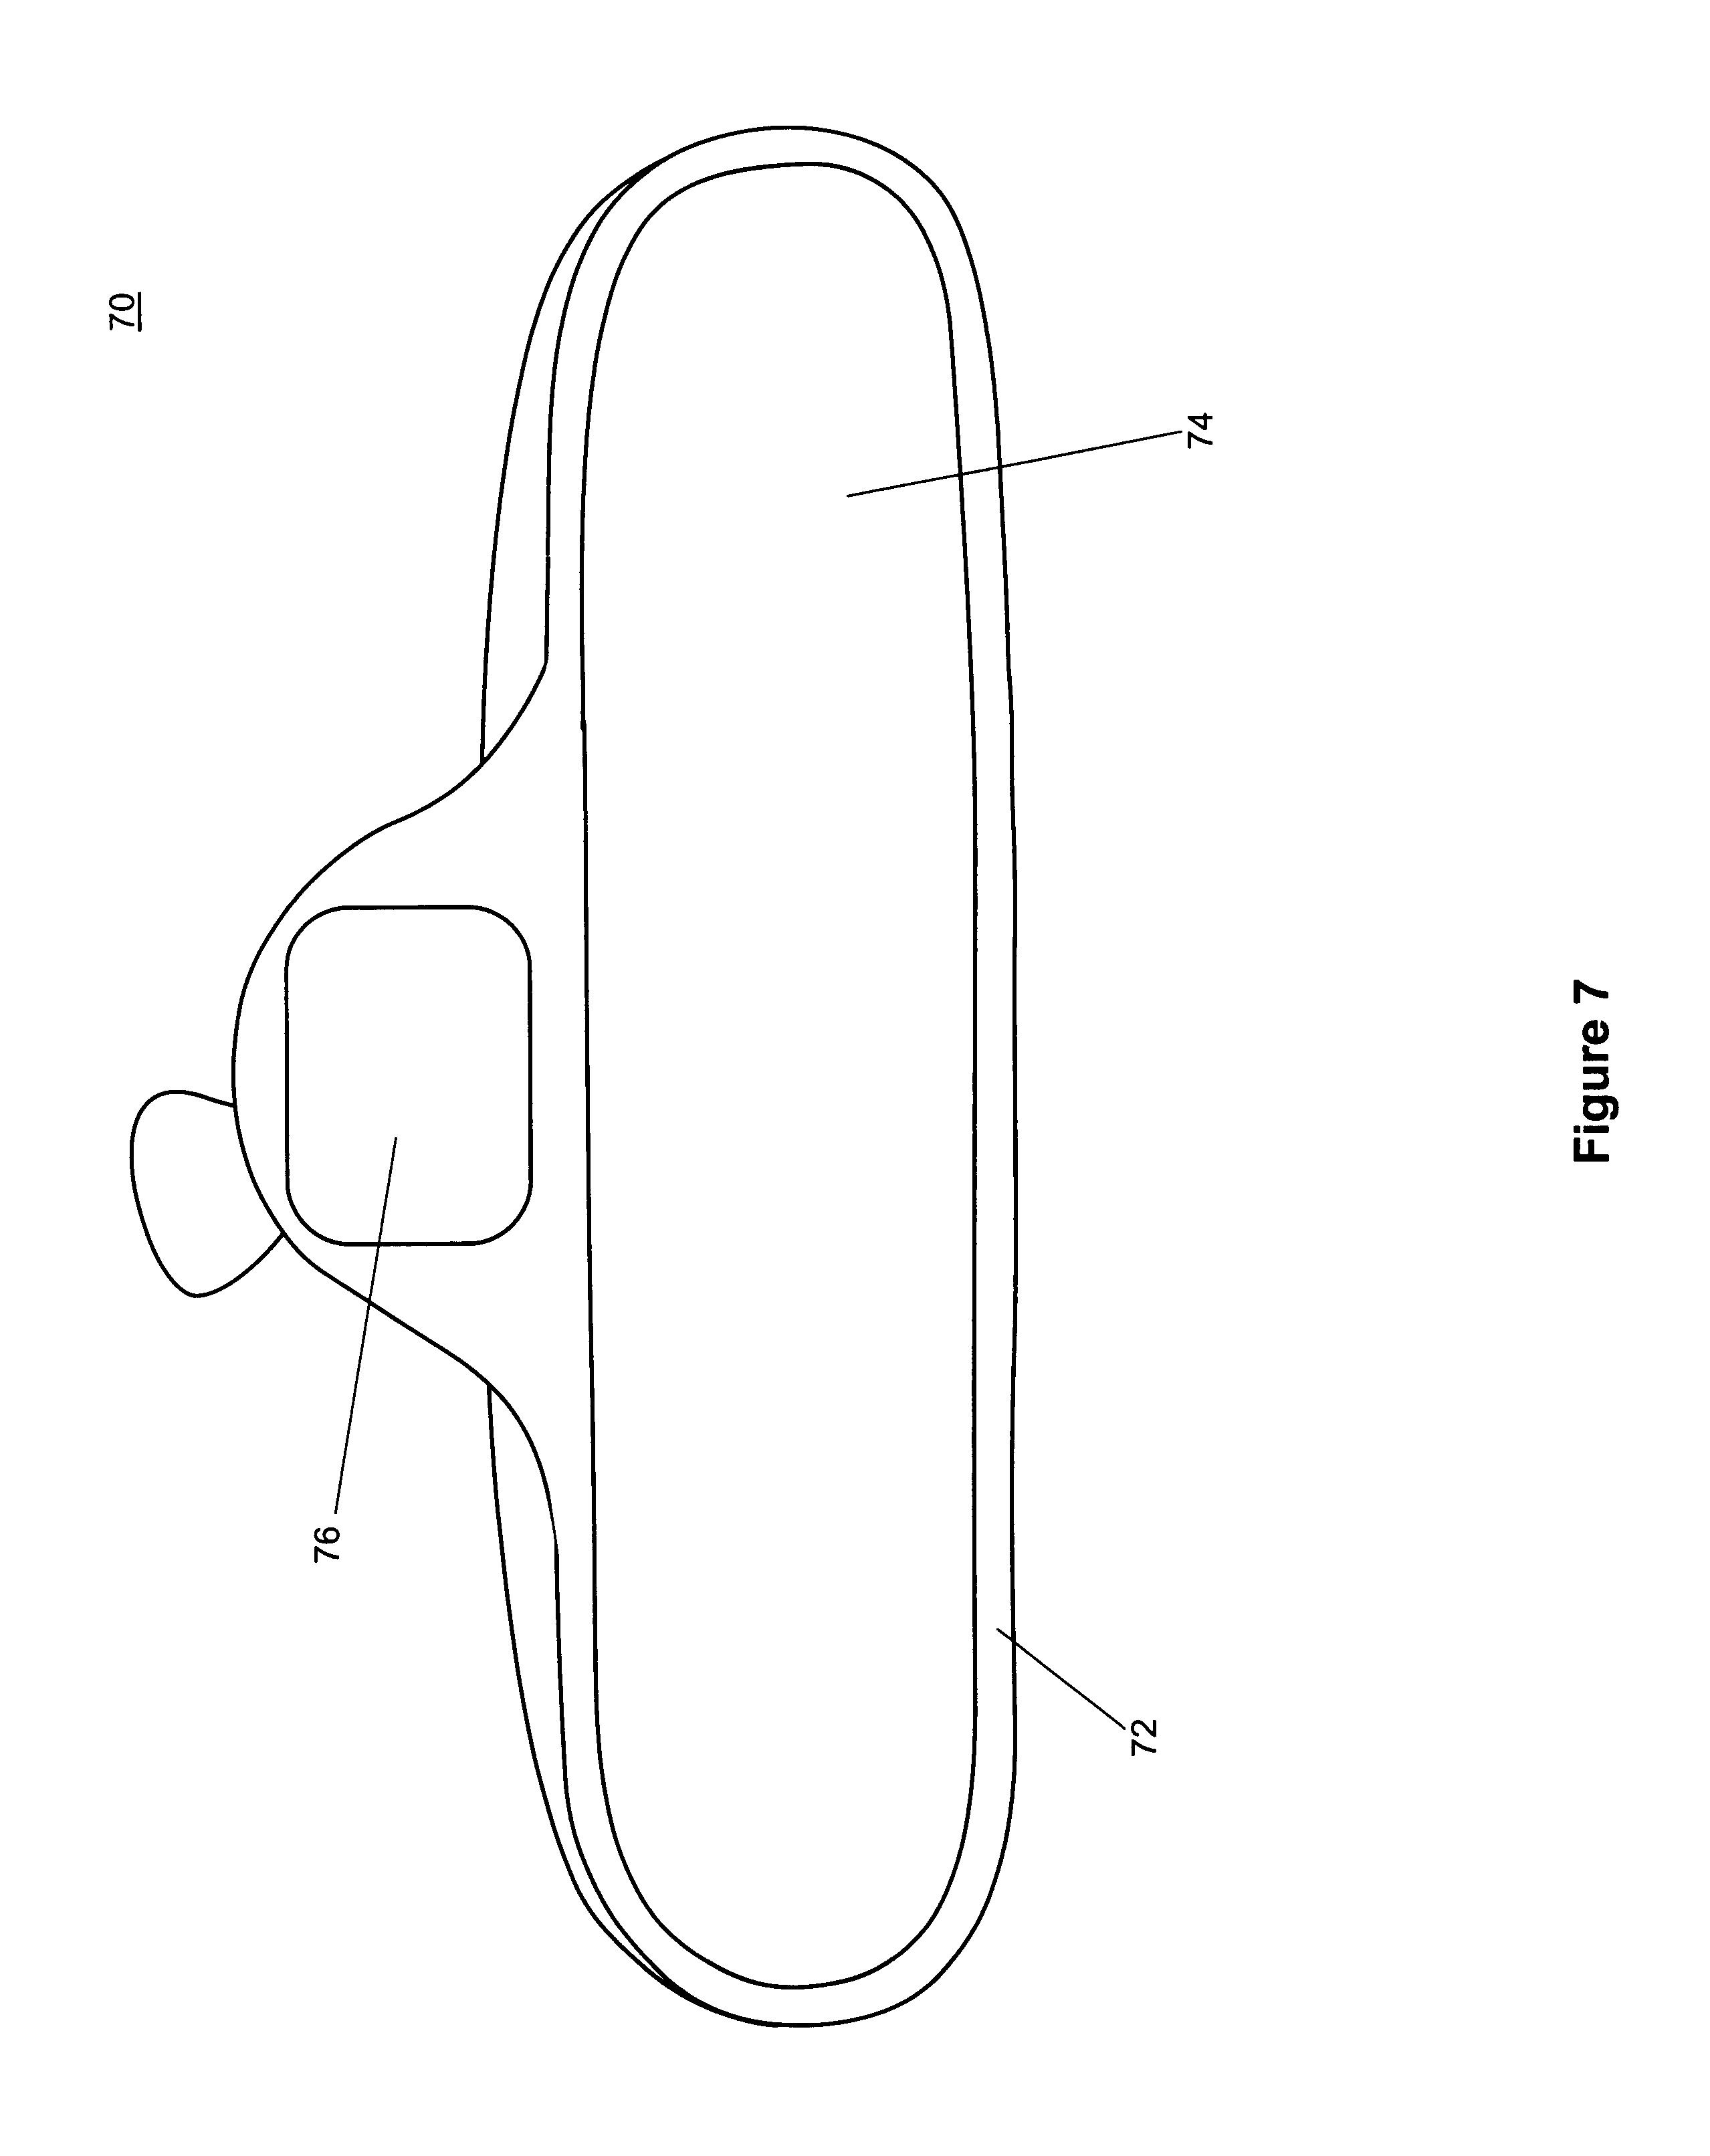 patent us 6 690 268 b2 Custom Car Wiring Harness Diagram patent